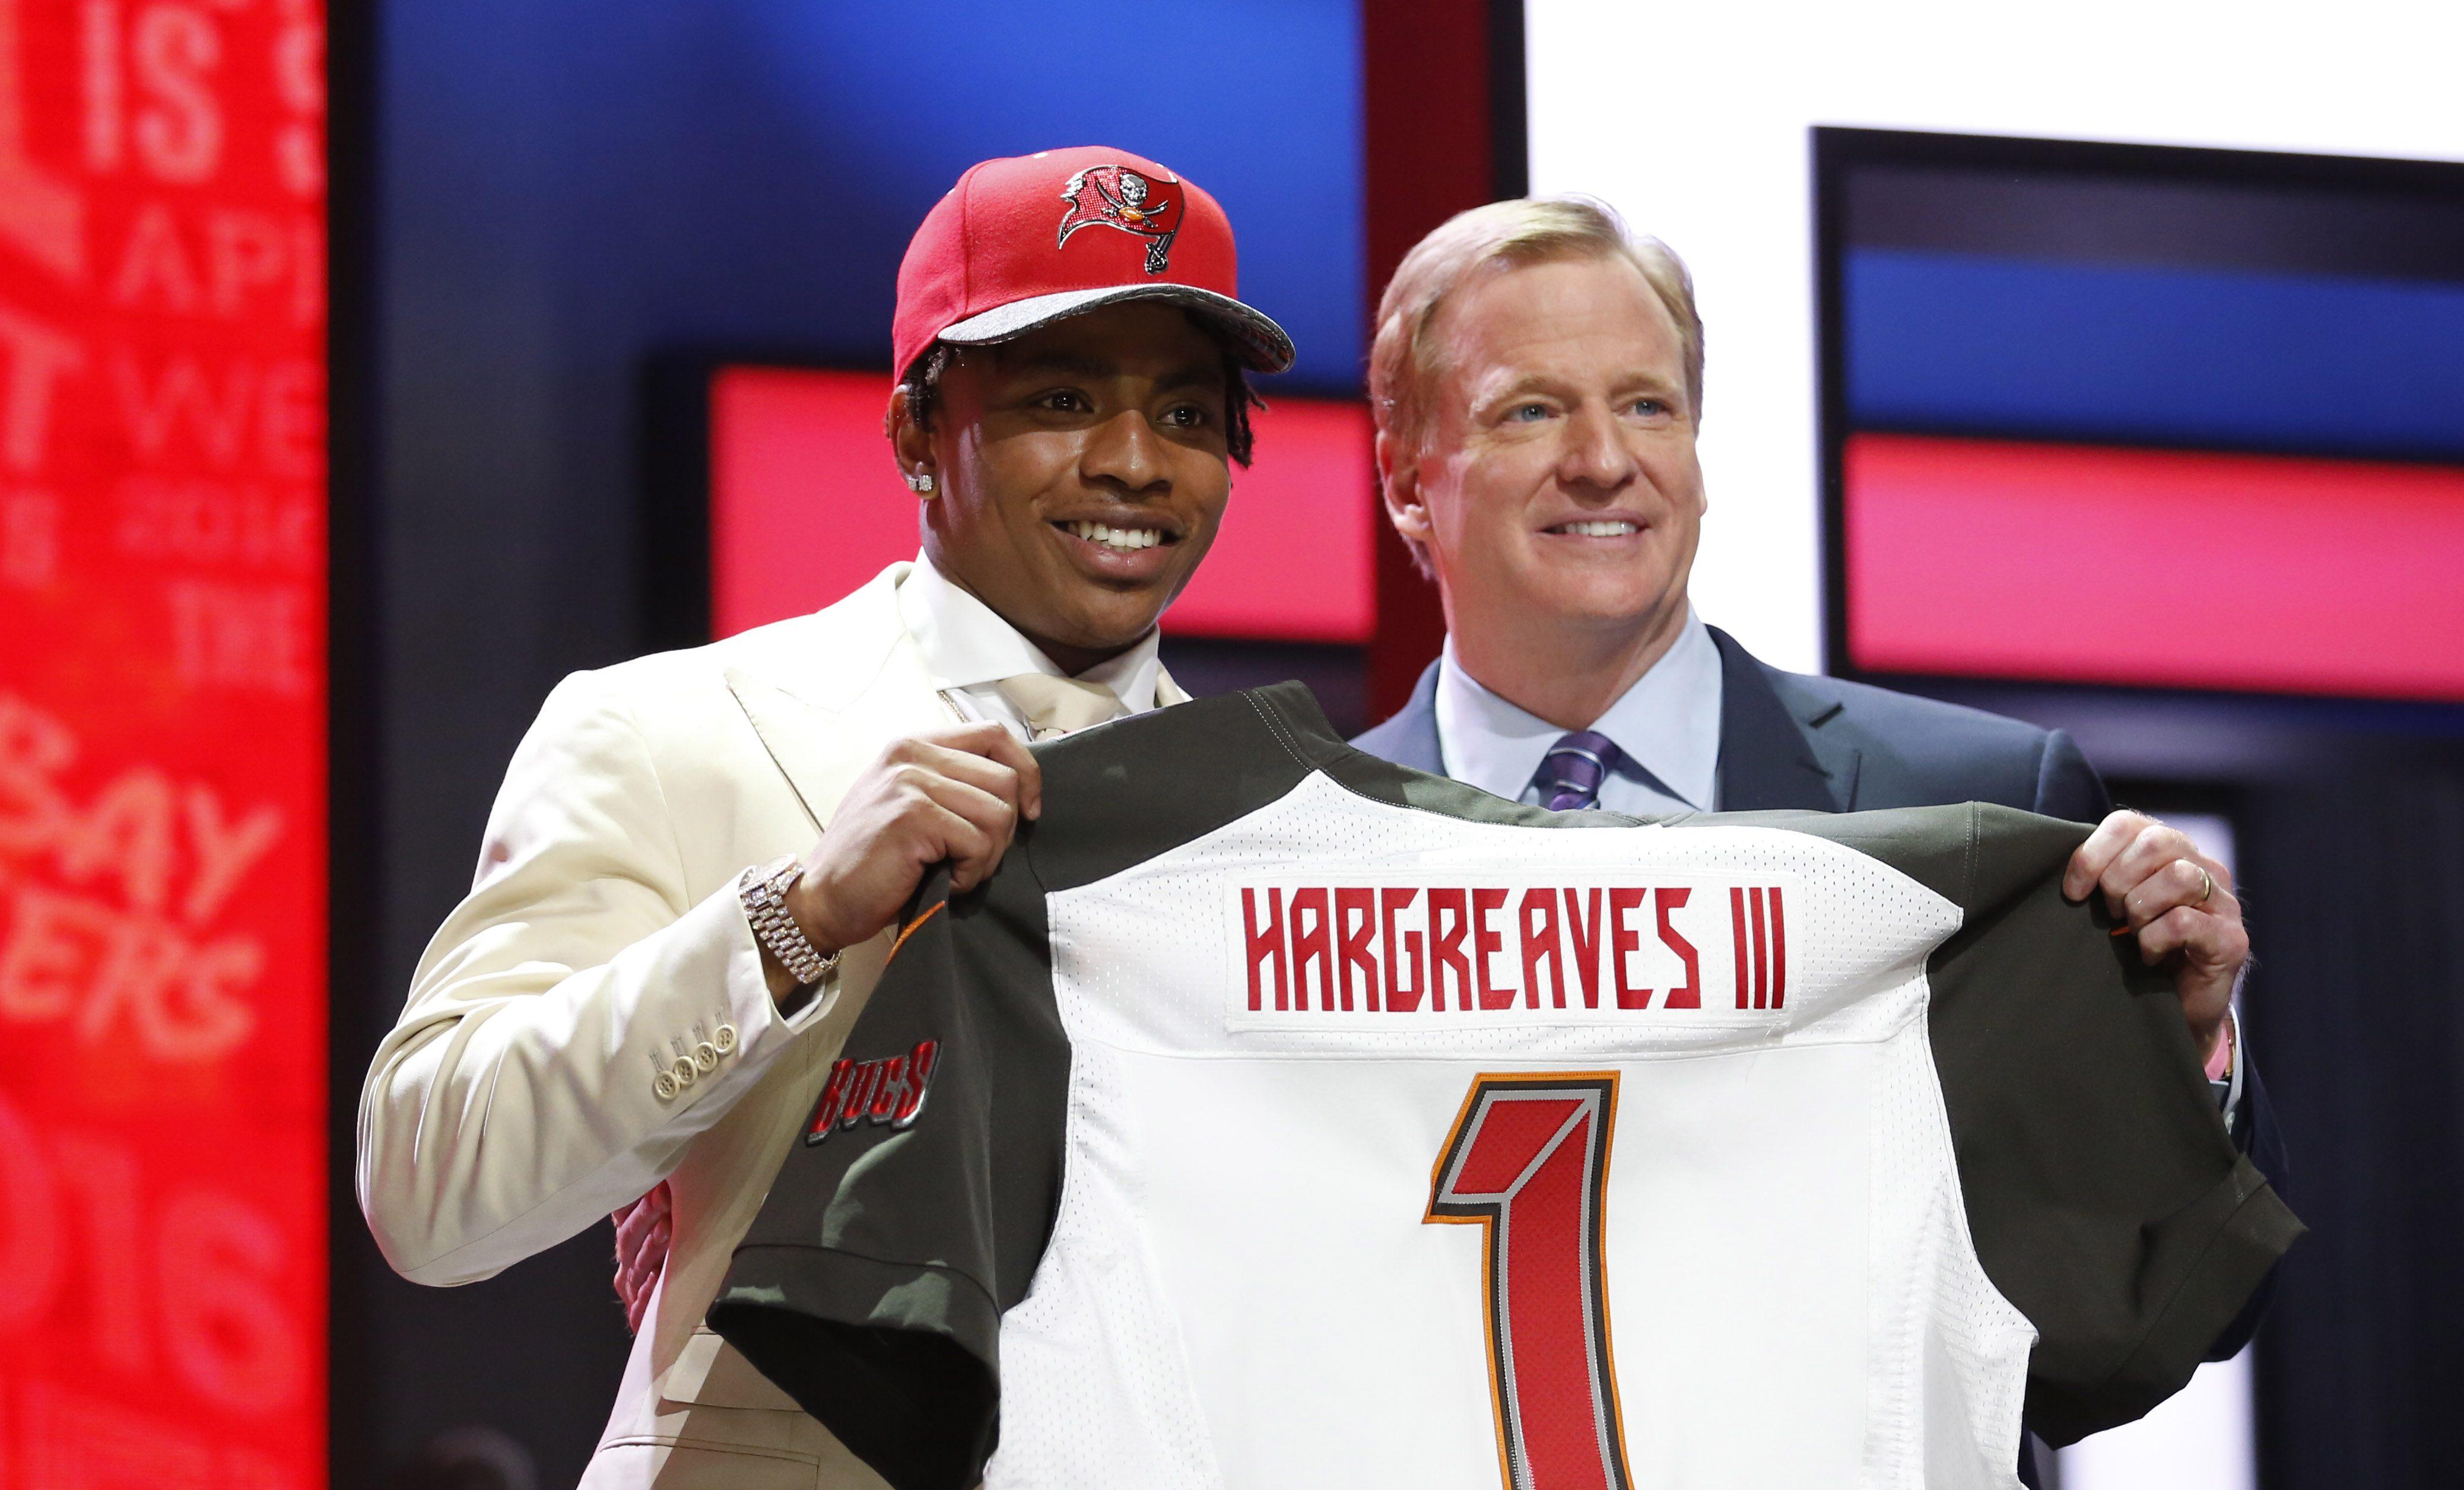 best service 30da1 ba722 Vernon Hargreaves Making Waves in Tampa - ESPN 98.1 FM - 850 ...